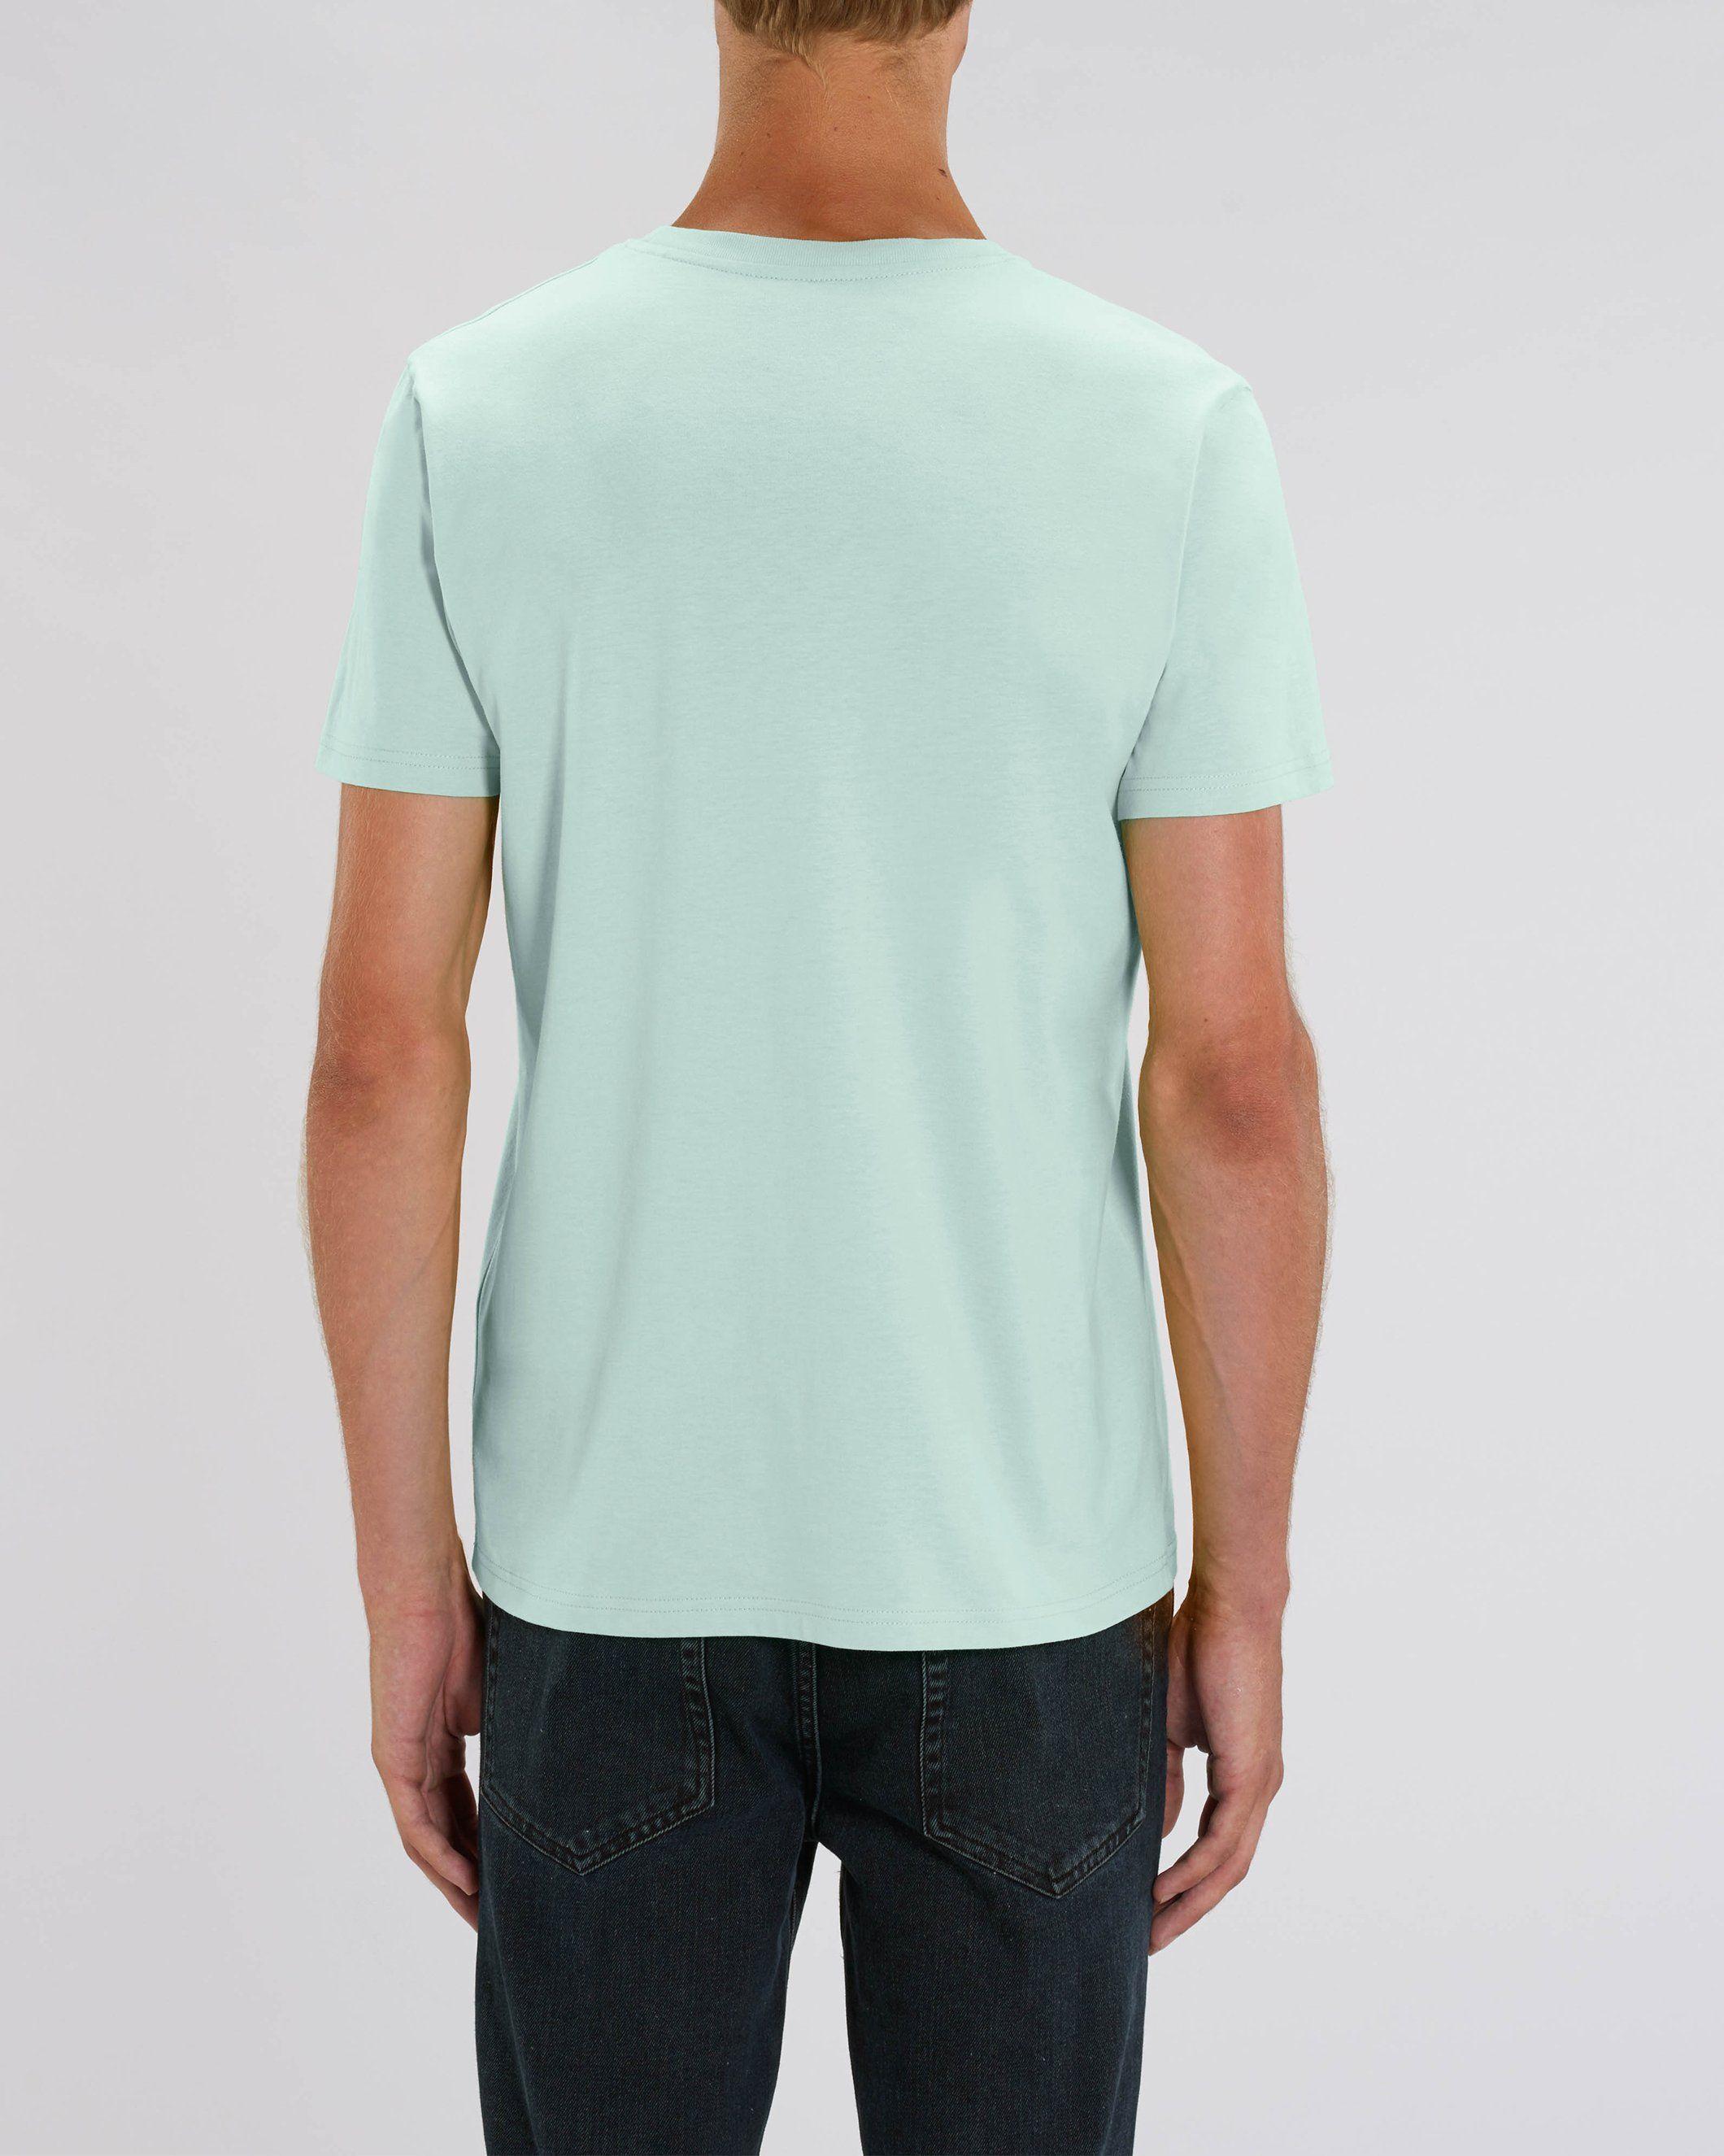 Nauli Unisex Regular Fit T-Shirt in Blue